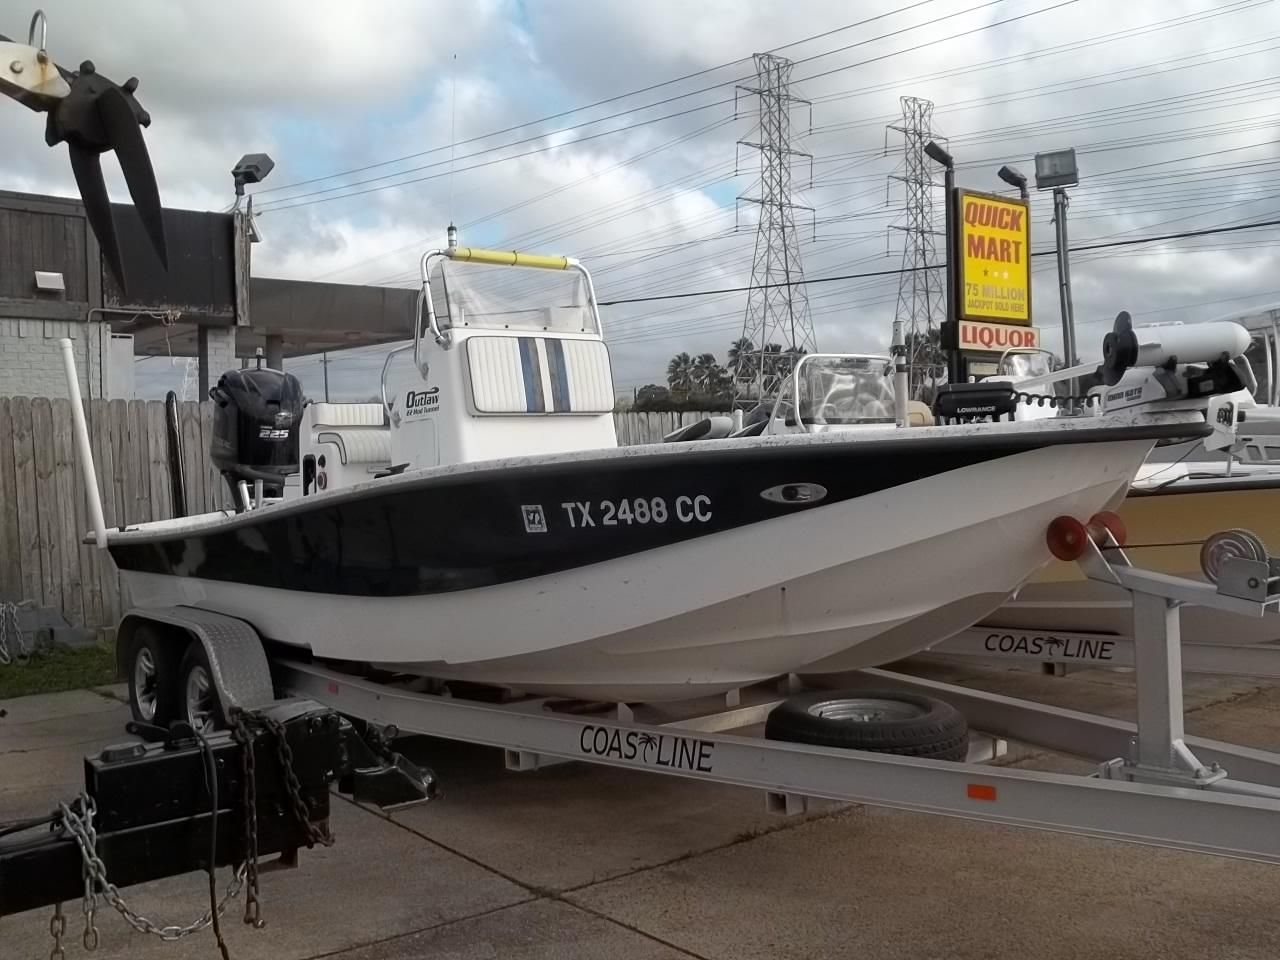 2014 Desperado 22 Outlaw Power Boat For Sale Vf 225 Yamaha Wiring Harness